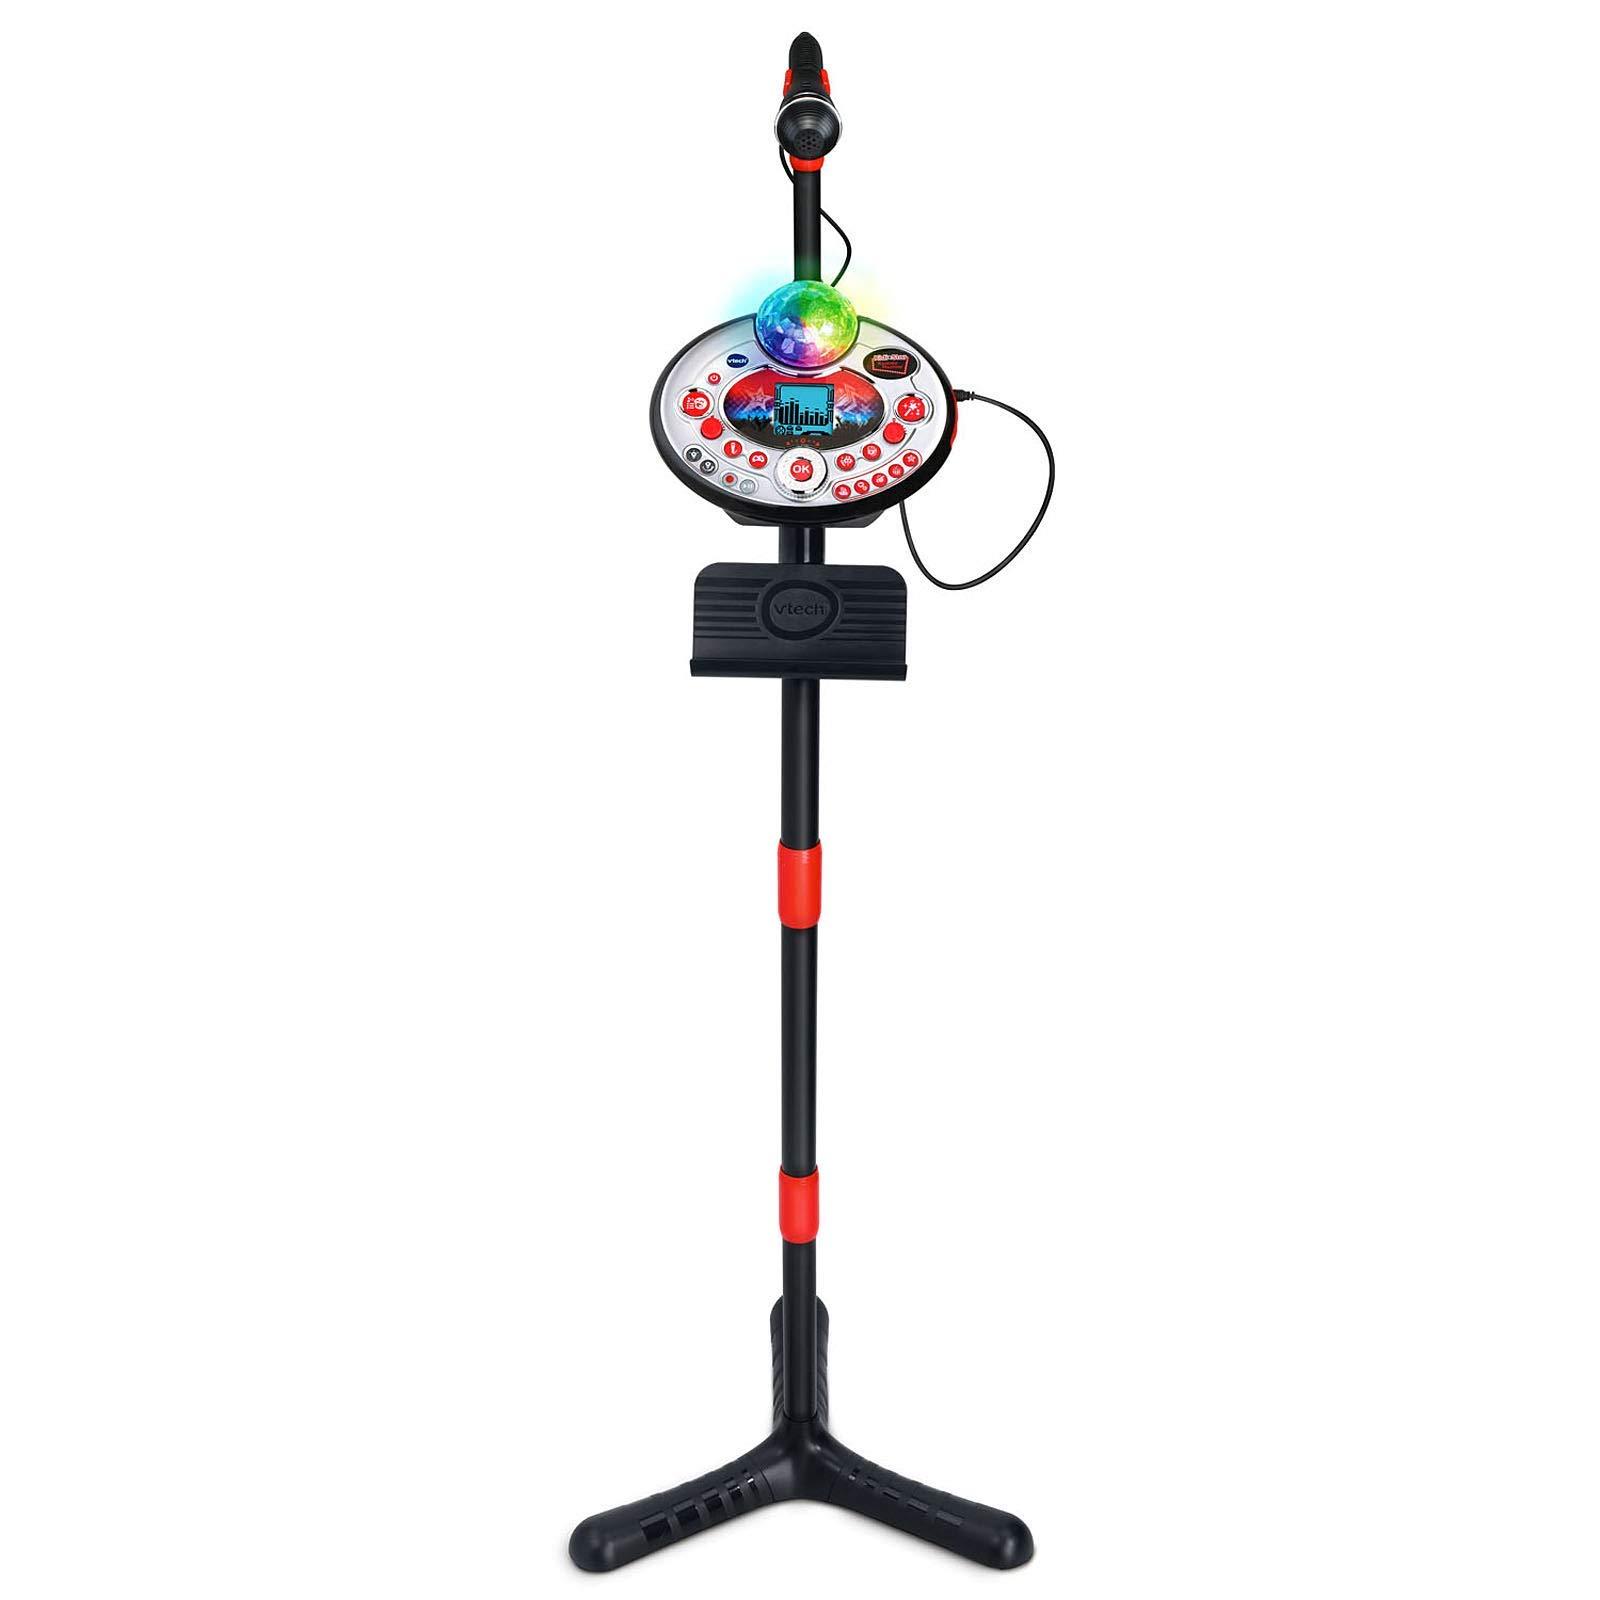 VTech Kidi Star Karaoke Machine (Black) (Renewed) by VTech (Image #3)